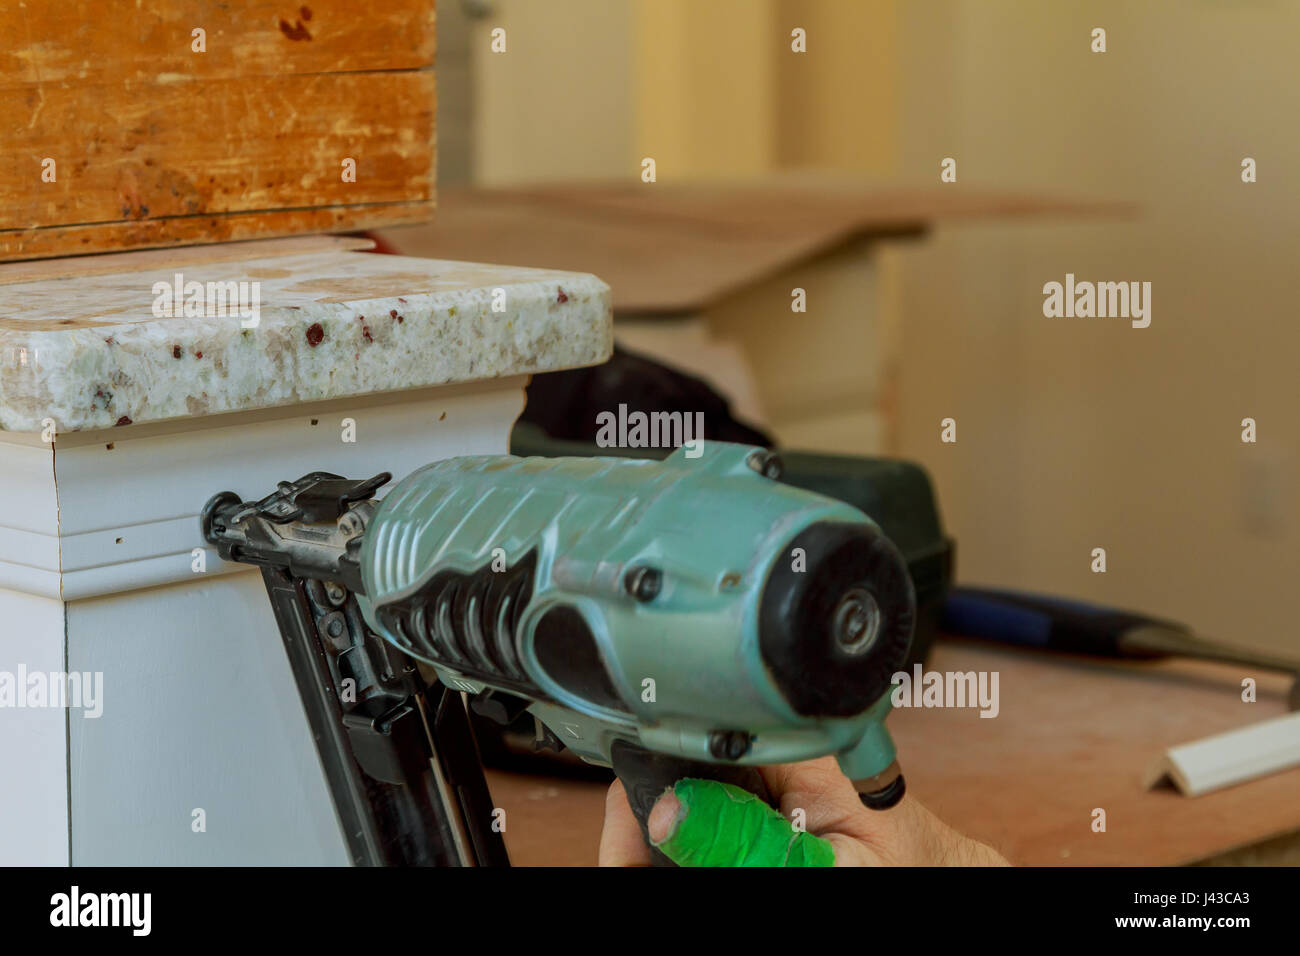 Man Wood Frame Stockfotos & Man Wood Frame Bilder - Seite 26 - Alamy